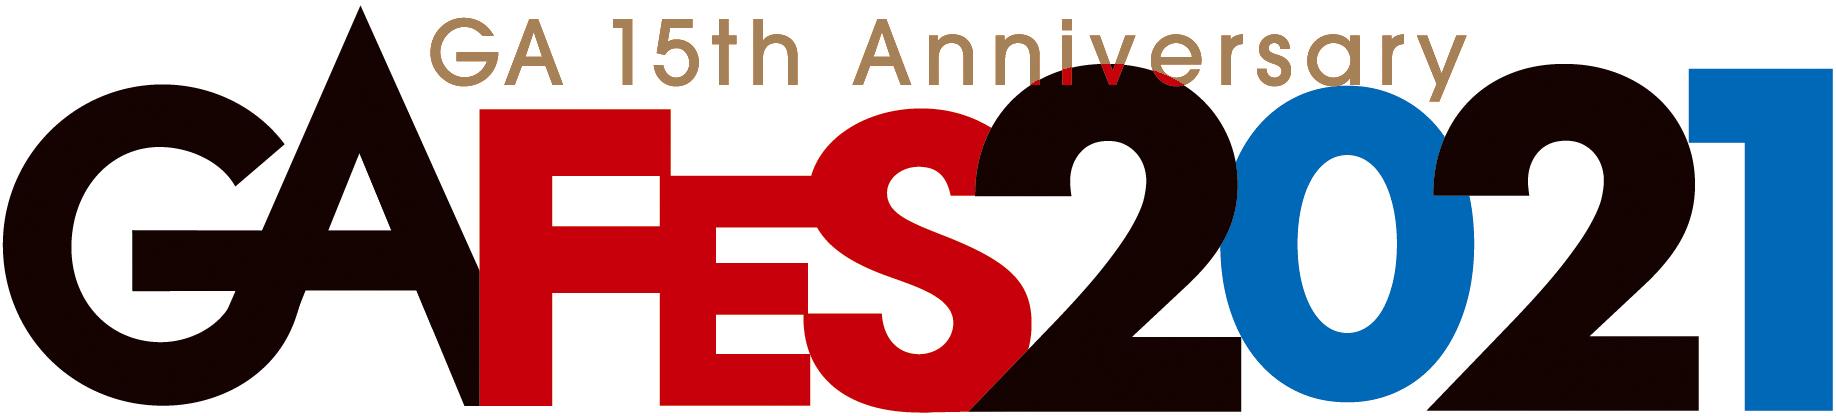 GA15周年プロジェクト!本渡 楓・千本木彩花ほか人気声優が多数出演の「GA FES 2021 ~GA 15th Anniversary~」タイムテーブル解禁!